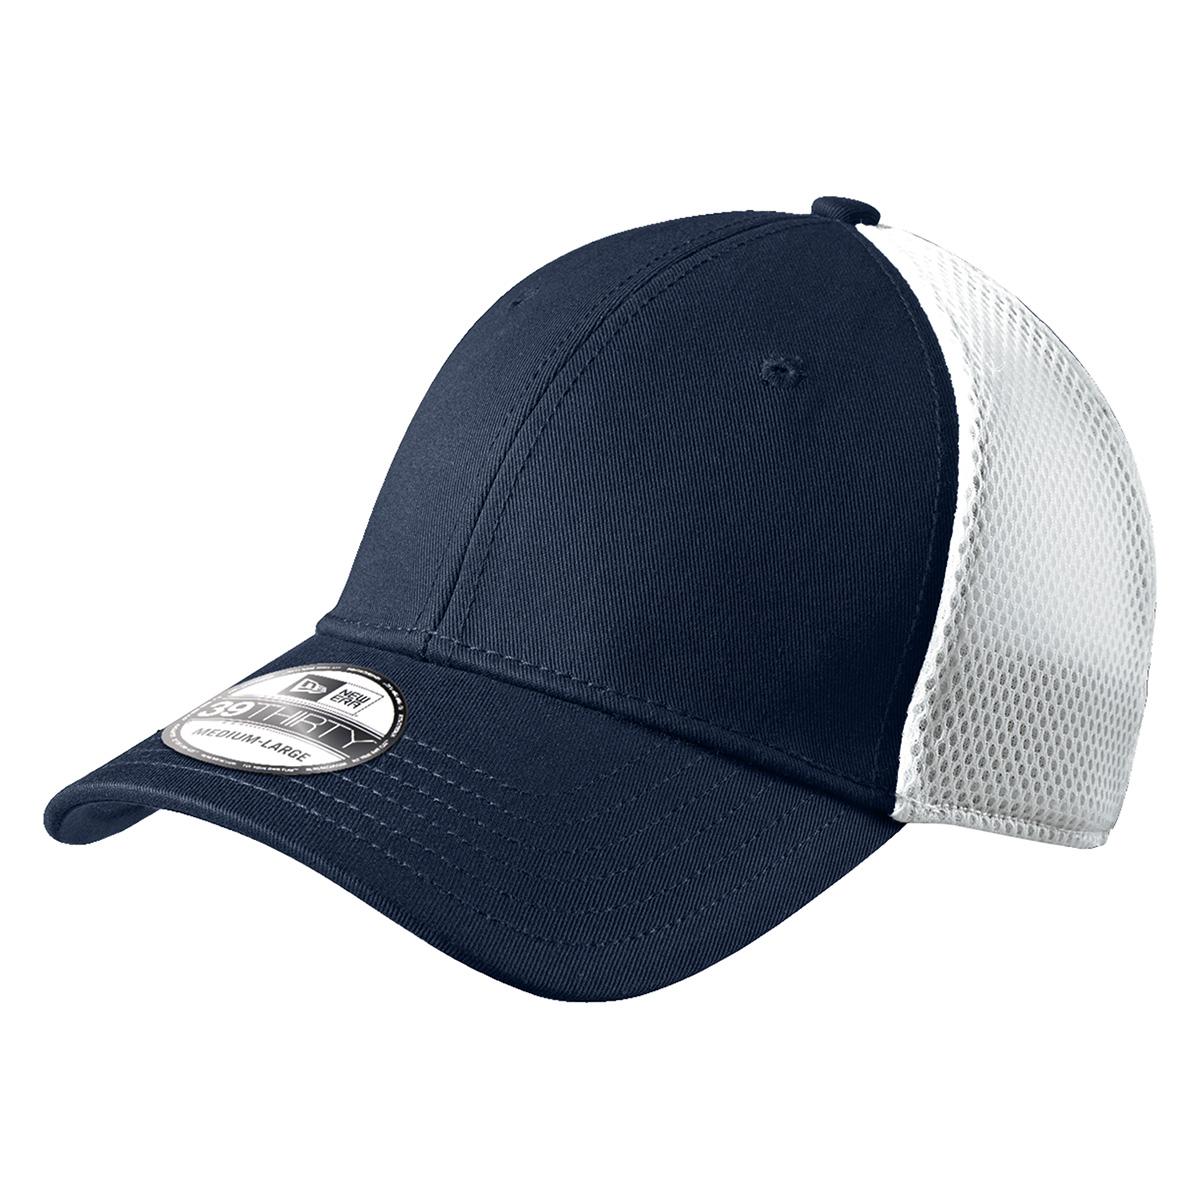 NE1020 New Era® Stretch Mesh Cap - Hit Promotional Products d0d43806536